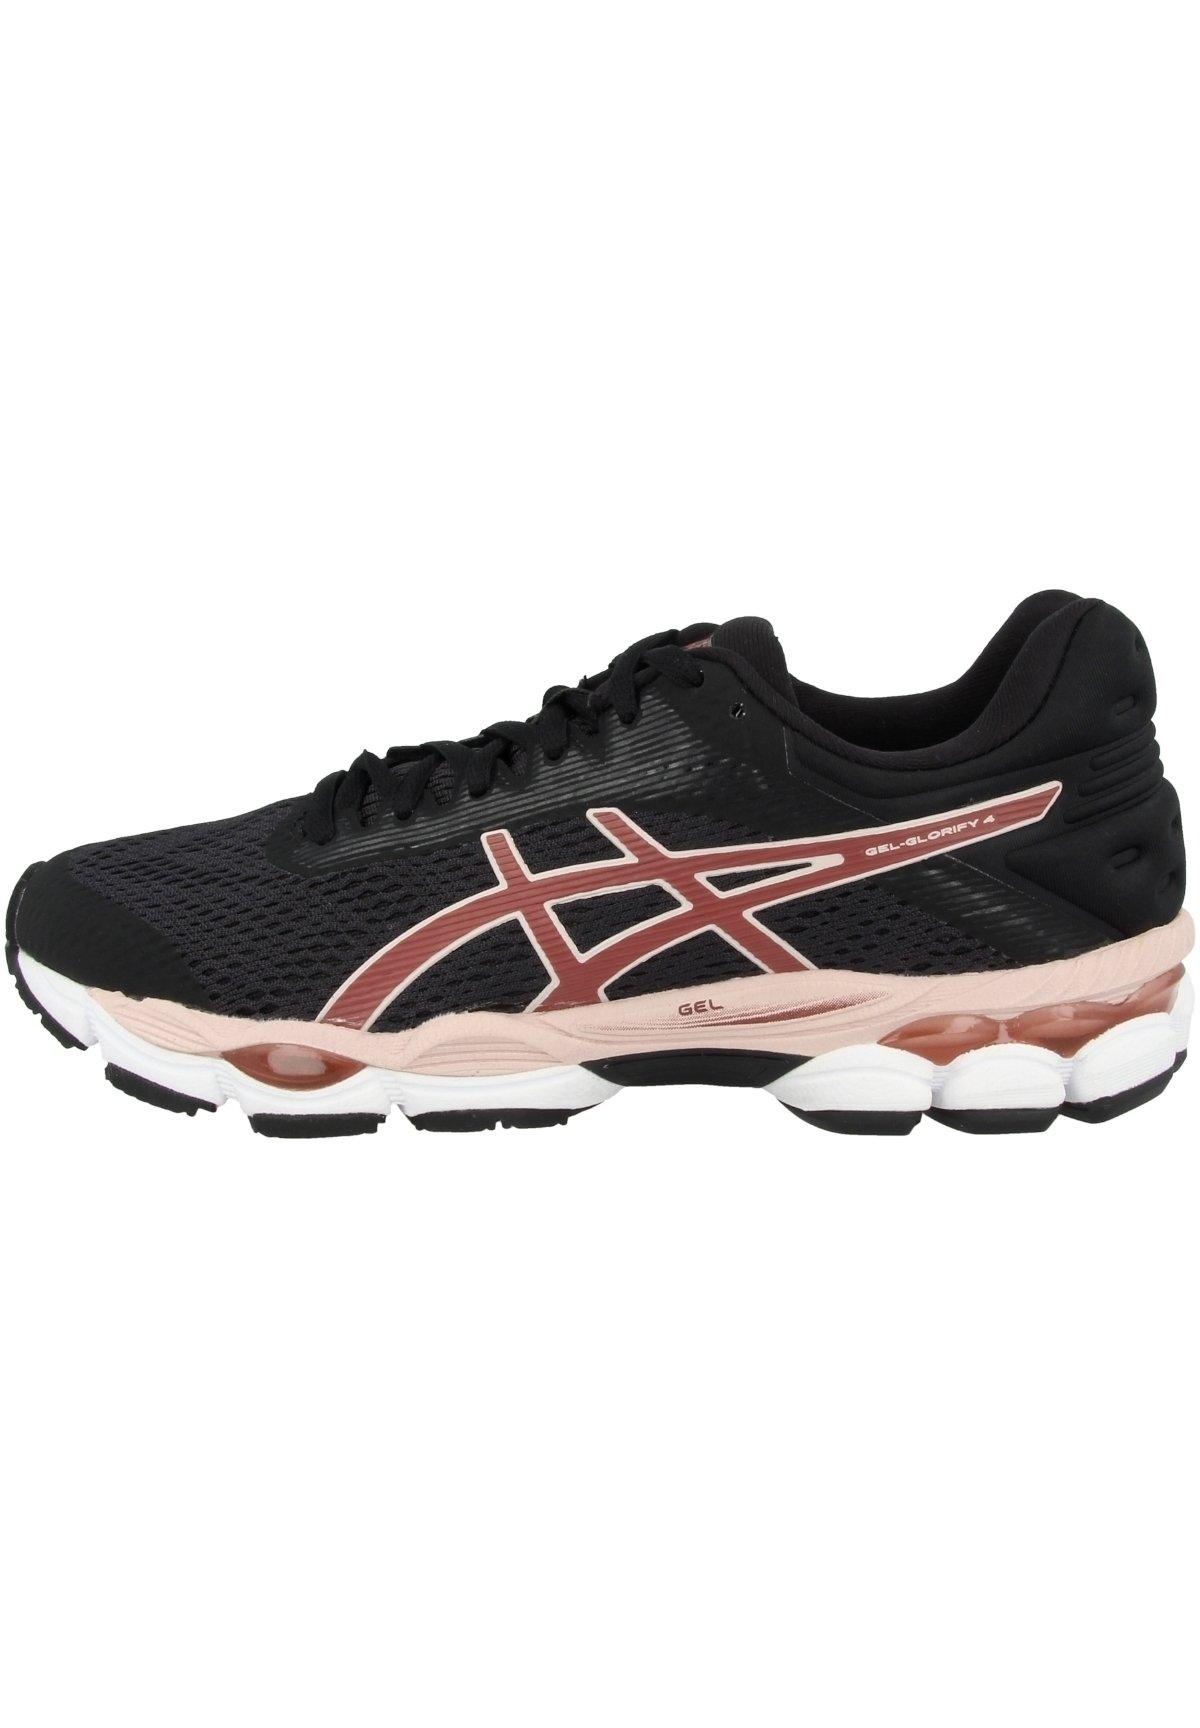 GEL-GLORIFY 4 - Neutral running shoes - black dried rose